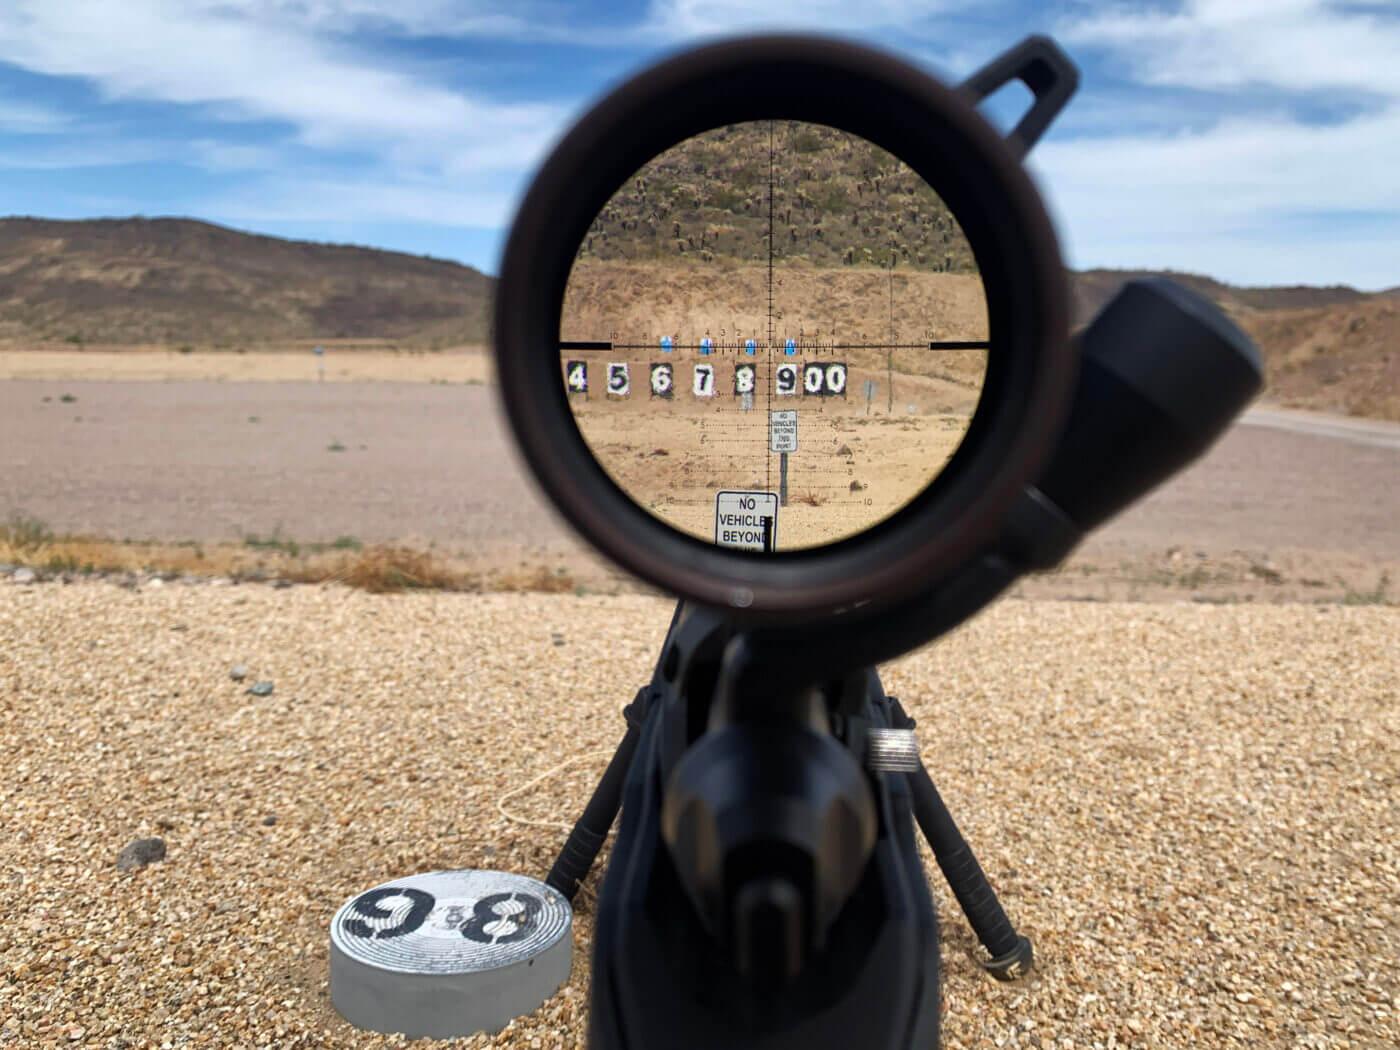 Vortex precision long range rifle scope view